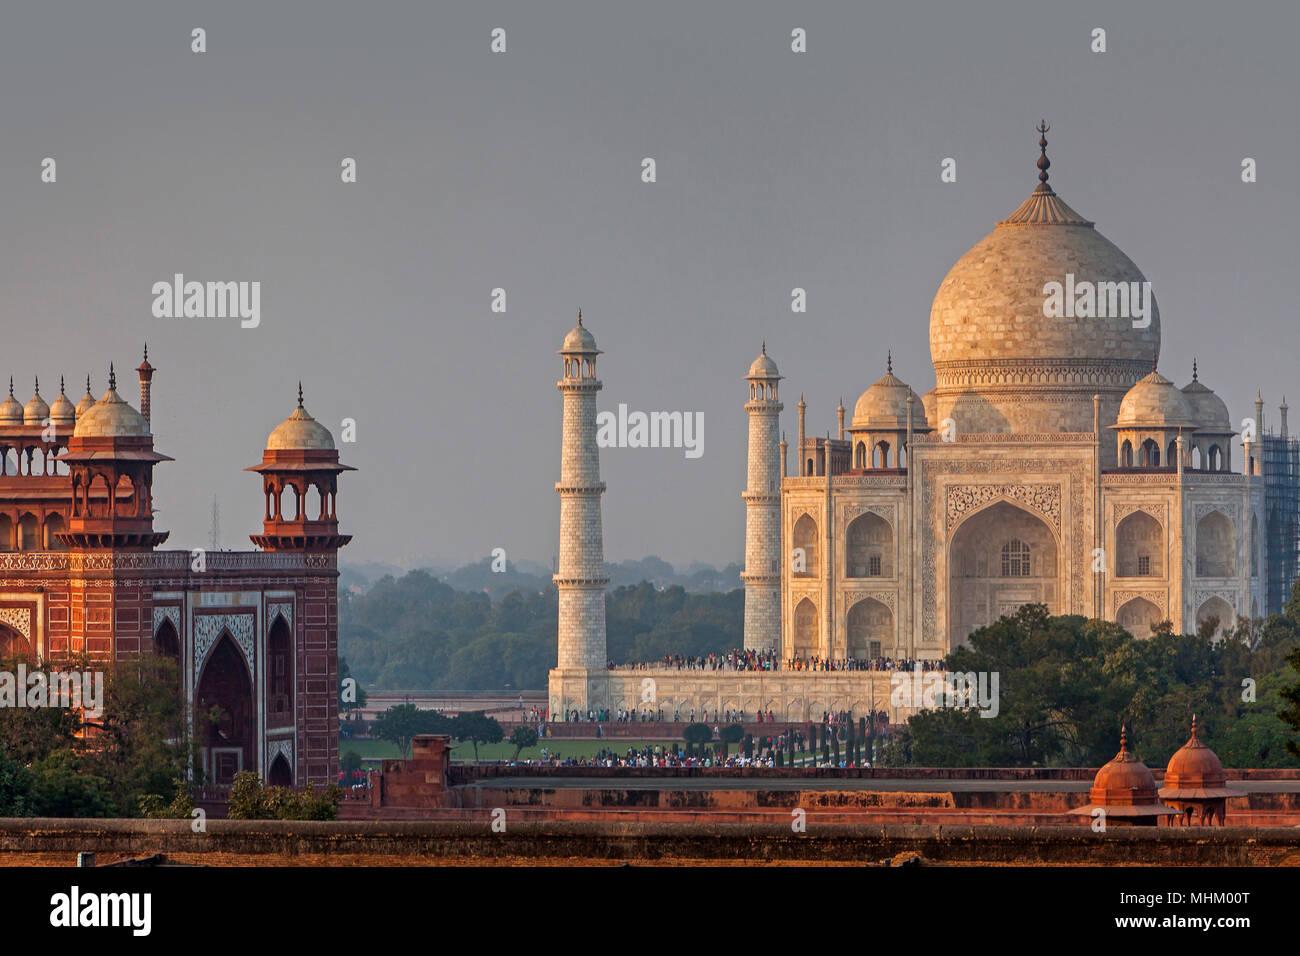 Taj Mahal, UNESCO World Heritage Site, Agra, Uttar Pradesh, Inde Photo Stock